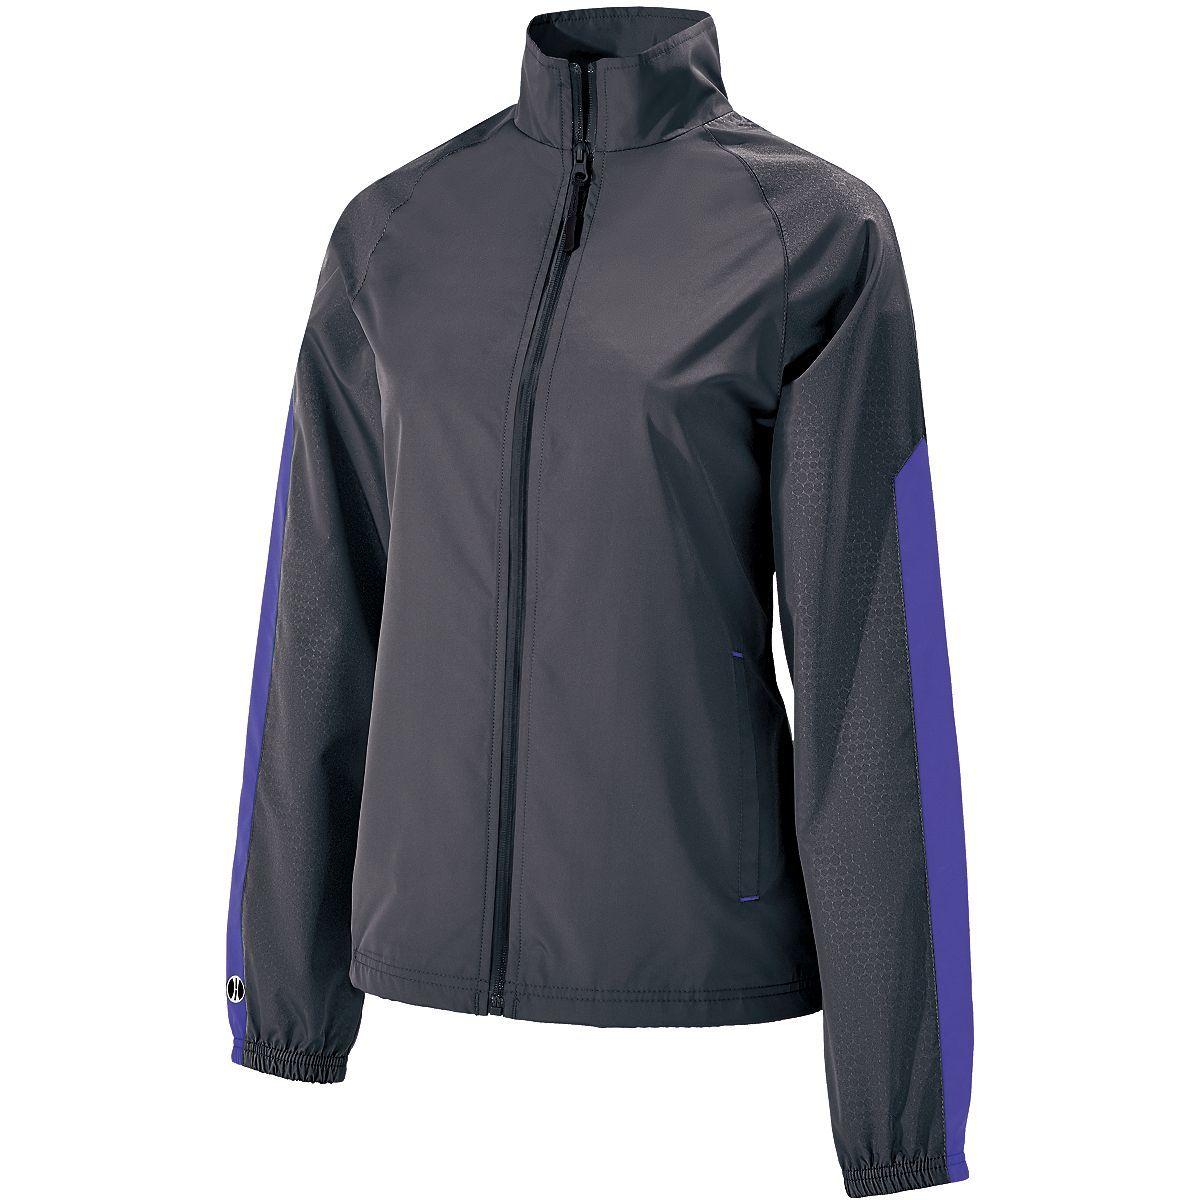 Ladies Bionic Jacket - Carbon/purple